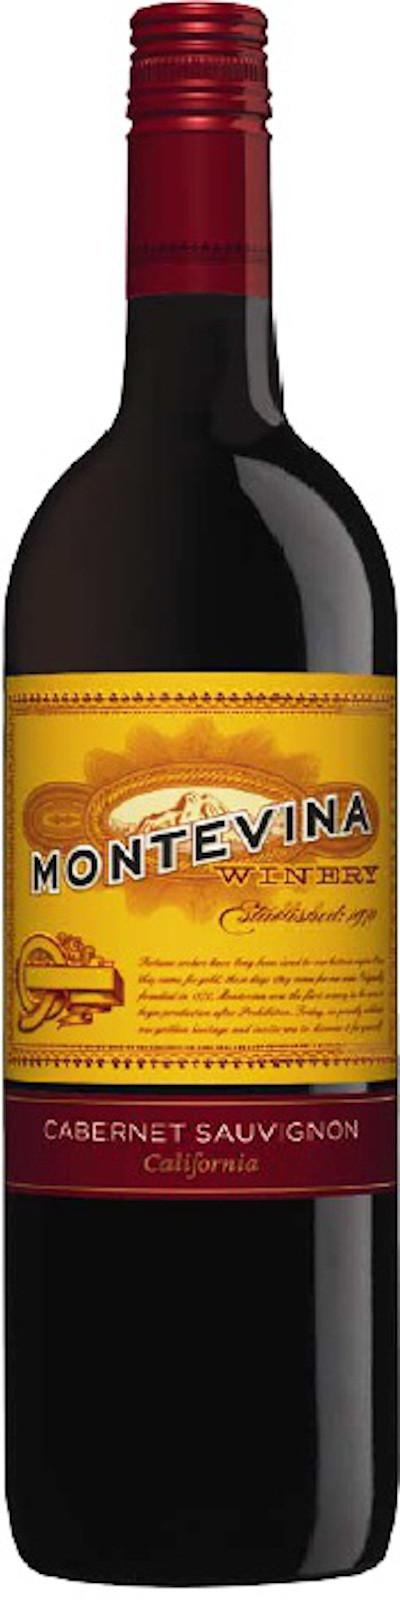 Montevina - Cabernet Sauvignon